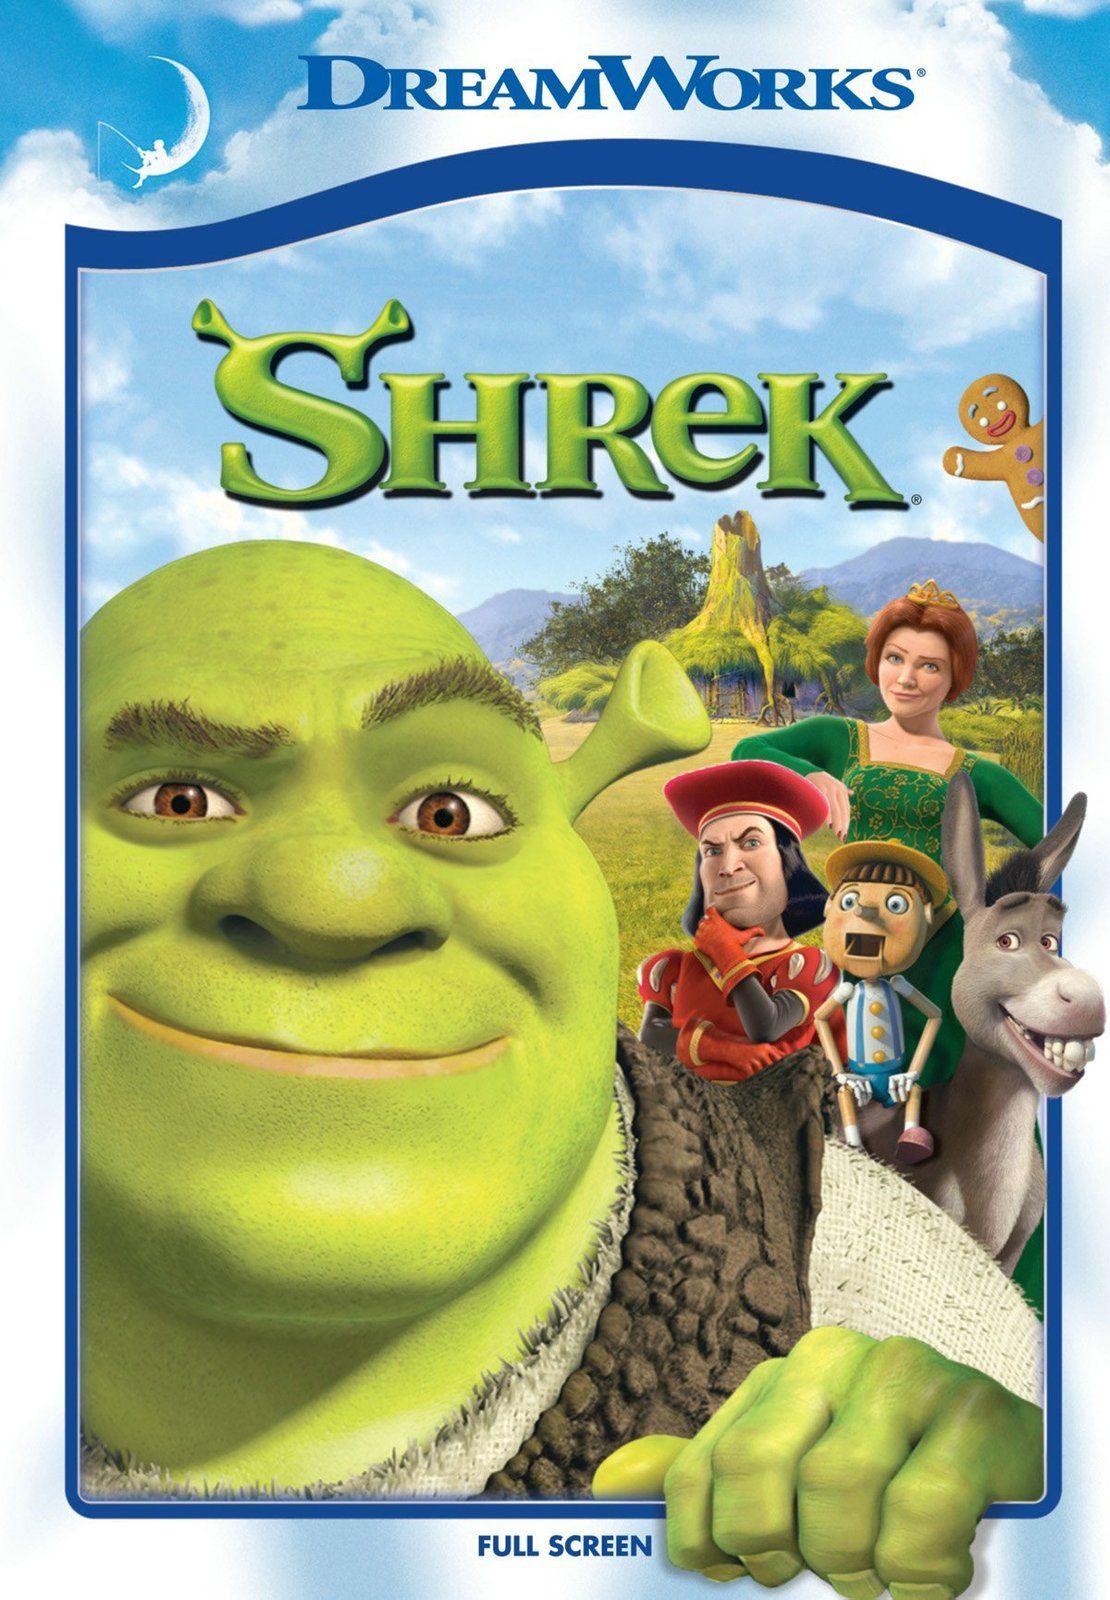 Shrek Directors Andrew Adamsom I Vicky Jenson Biblioteca L Almodi Dibuixox Animats I 791 Shr Peliculas De Animacion Shrek El Nino Pelicula